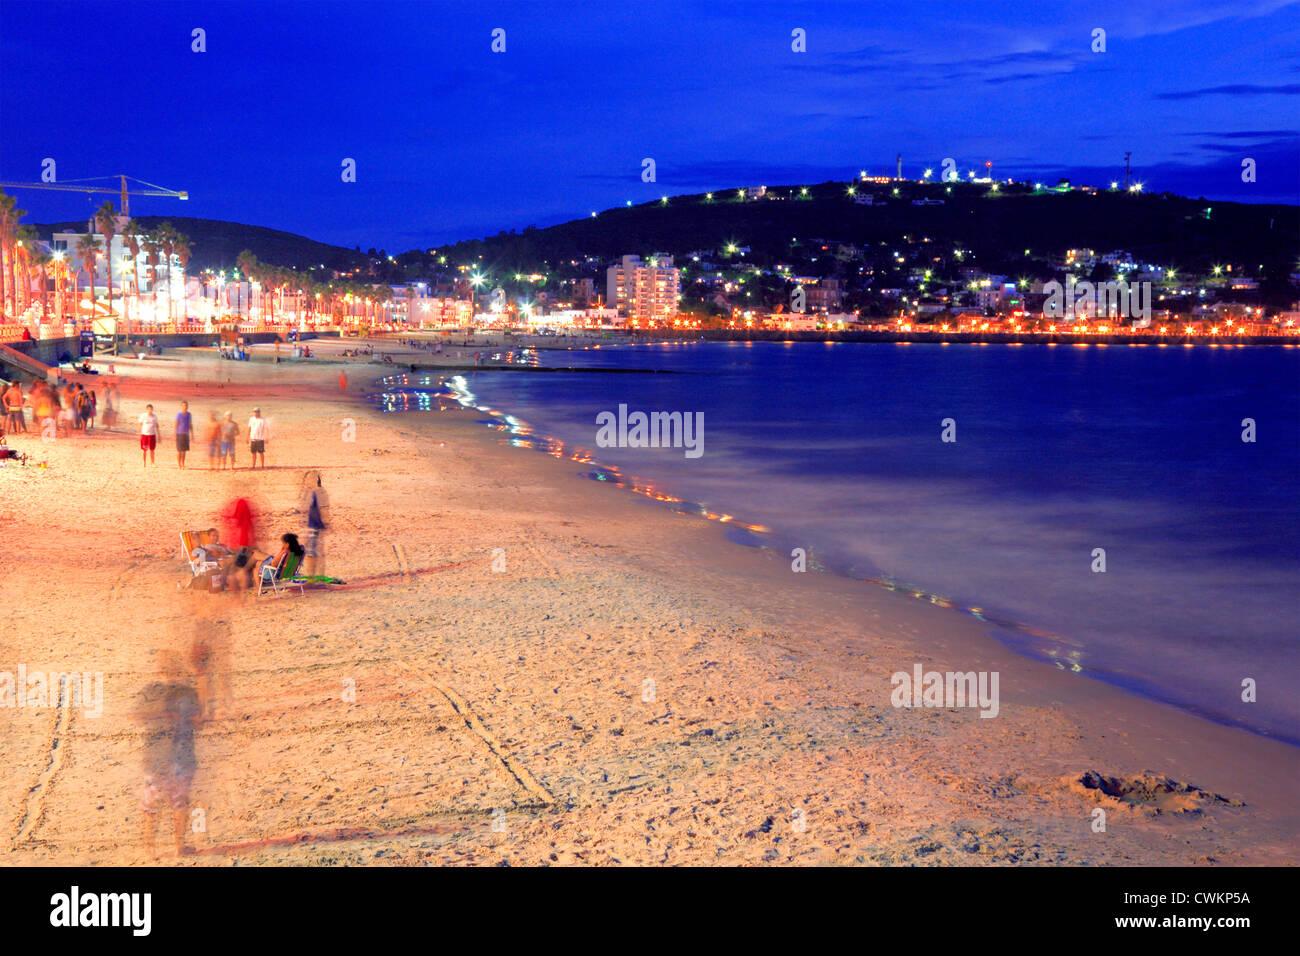 Piriapolis harbor and beach at sunset or twilight. Maldonado, Uruguay. - Stock Image